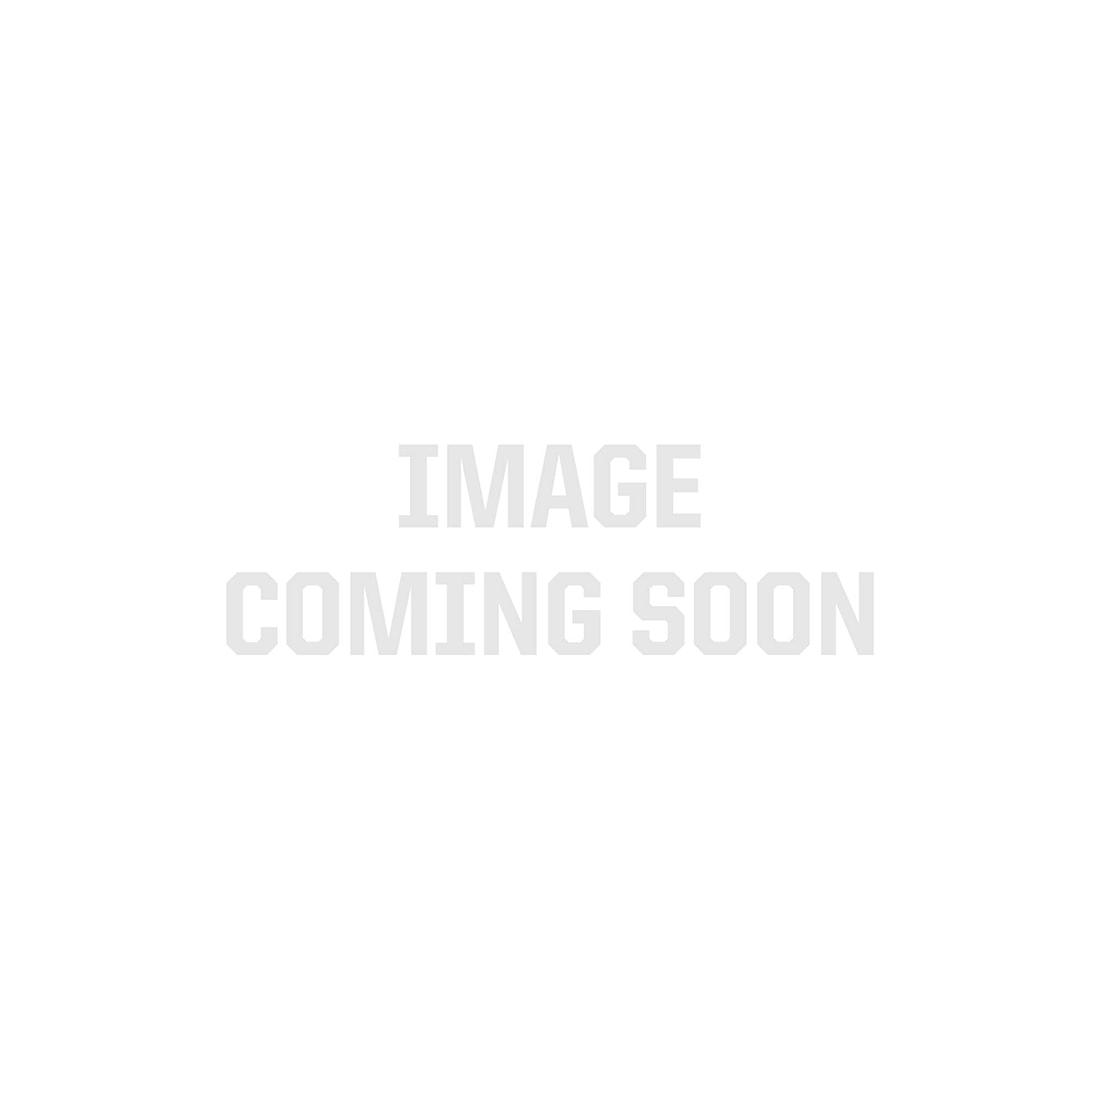 Waterproof Amber 3528 LED Strip Light, 60/m, 8mm wide, Sample Kit